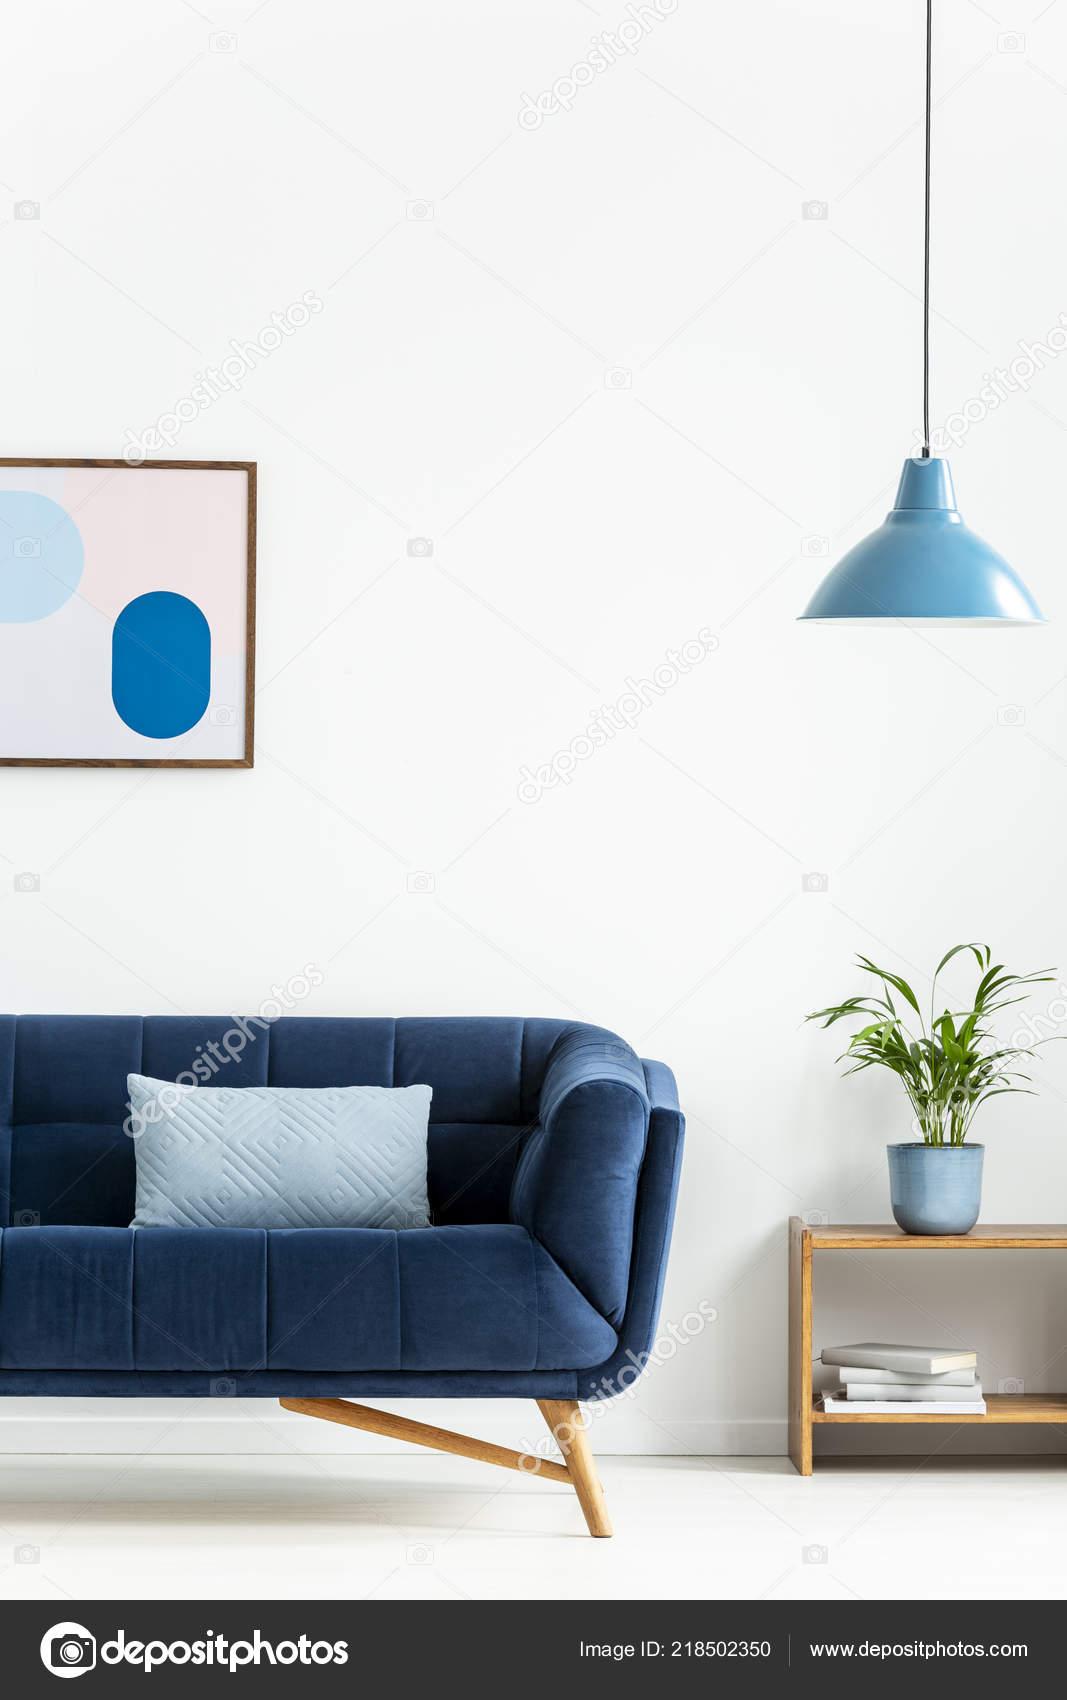 Sensational Retro Bowl Pendant Light Baby Blue Cushion Dark Elegant Sofa Dailytribune Chair Design For Home Dailytribuneorg